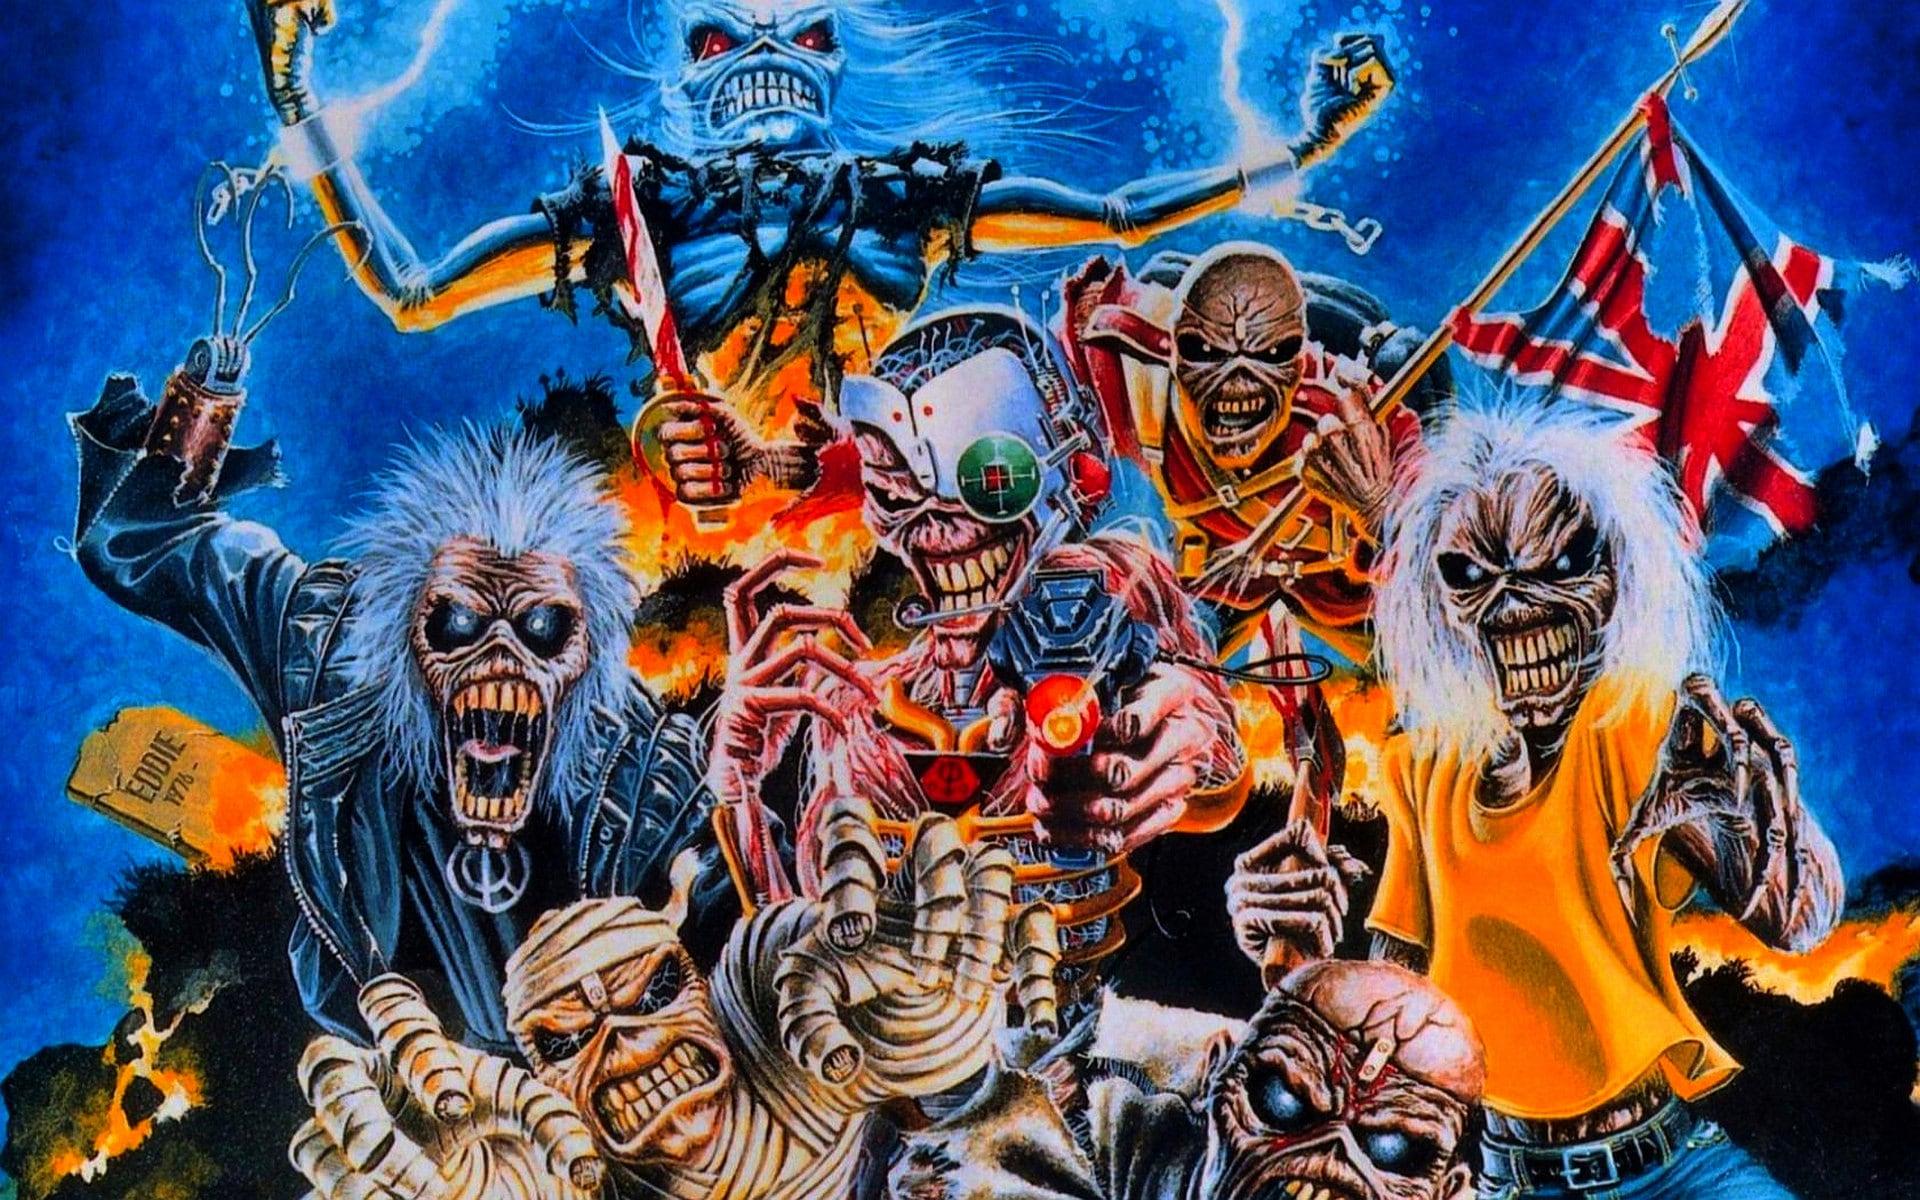 Iron Maiden Wallpapers Widescreen